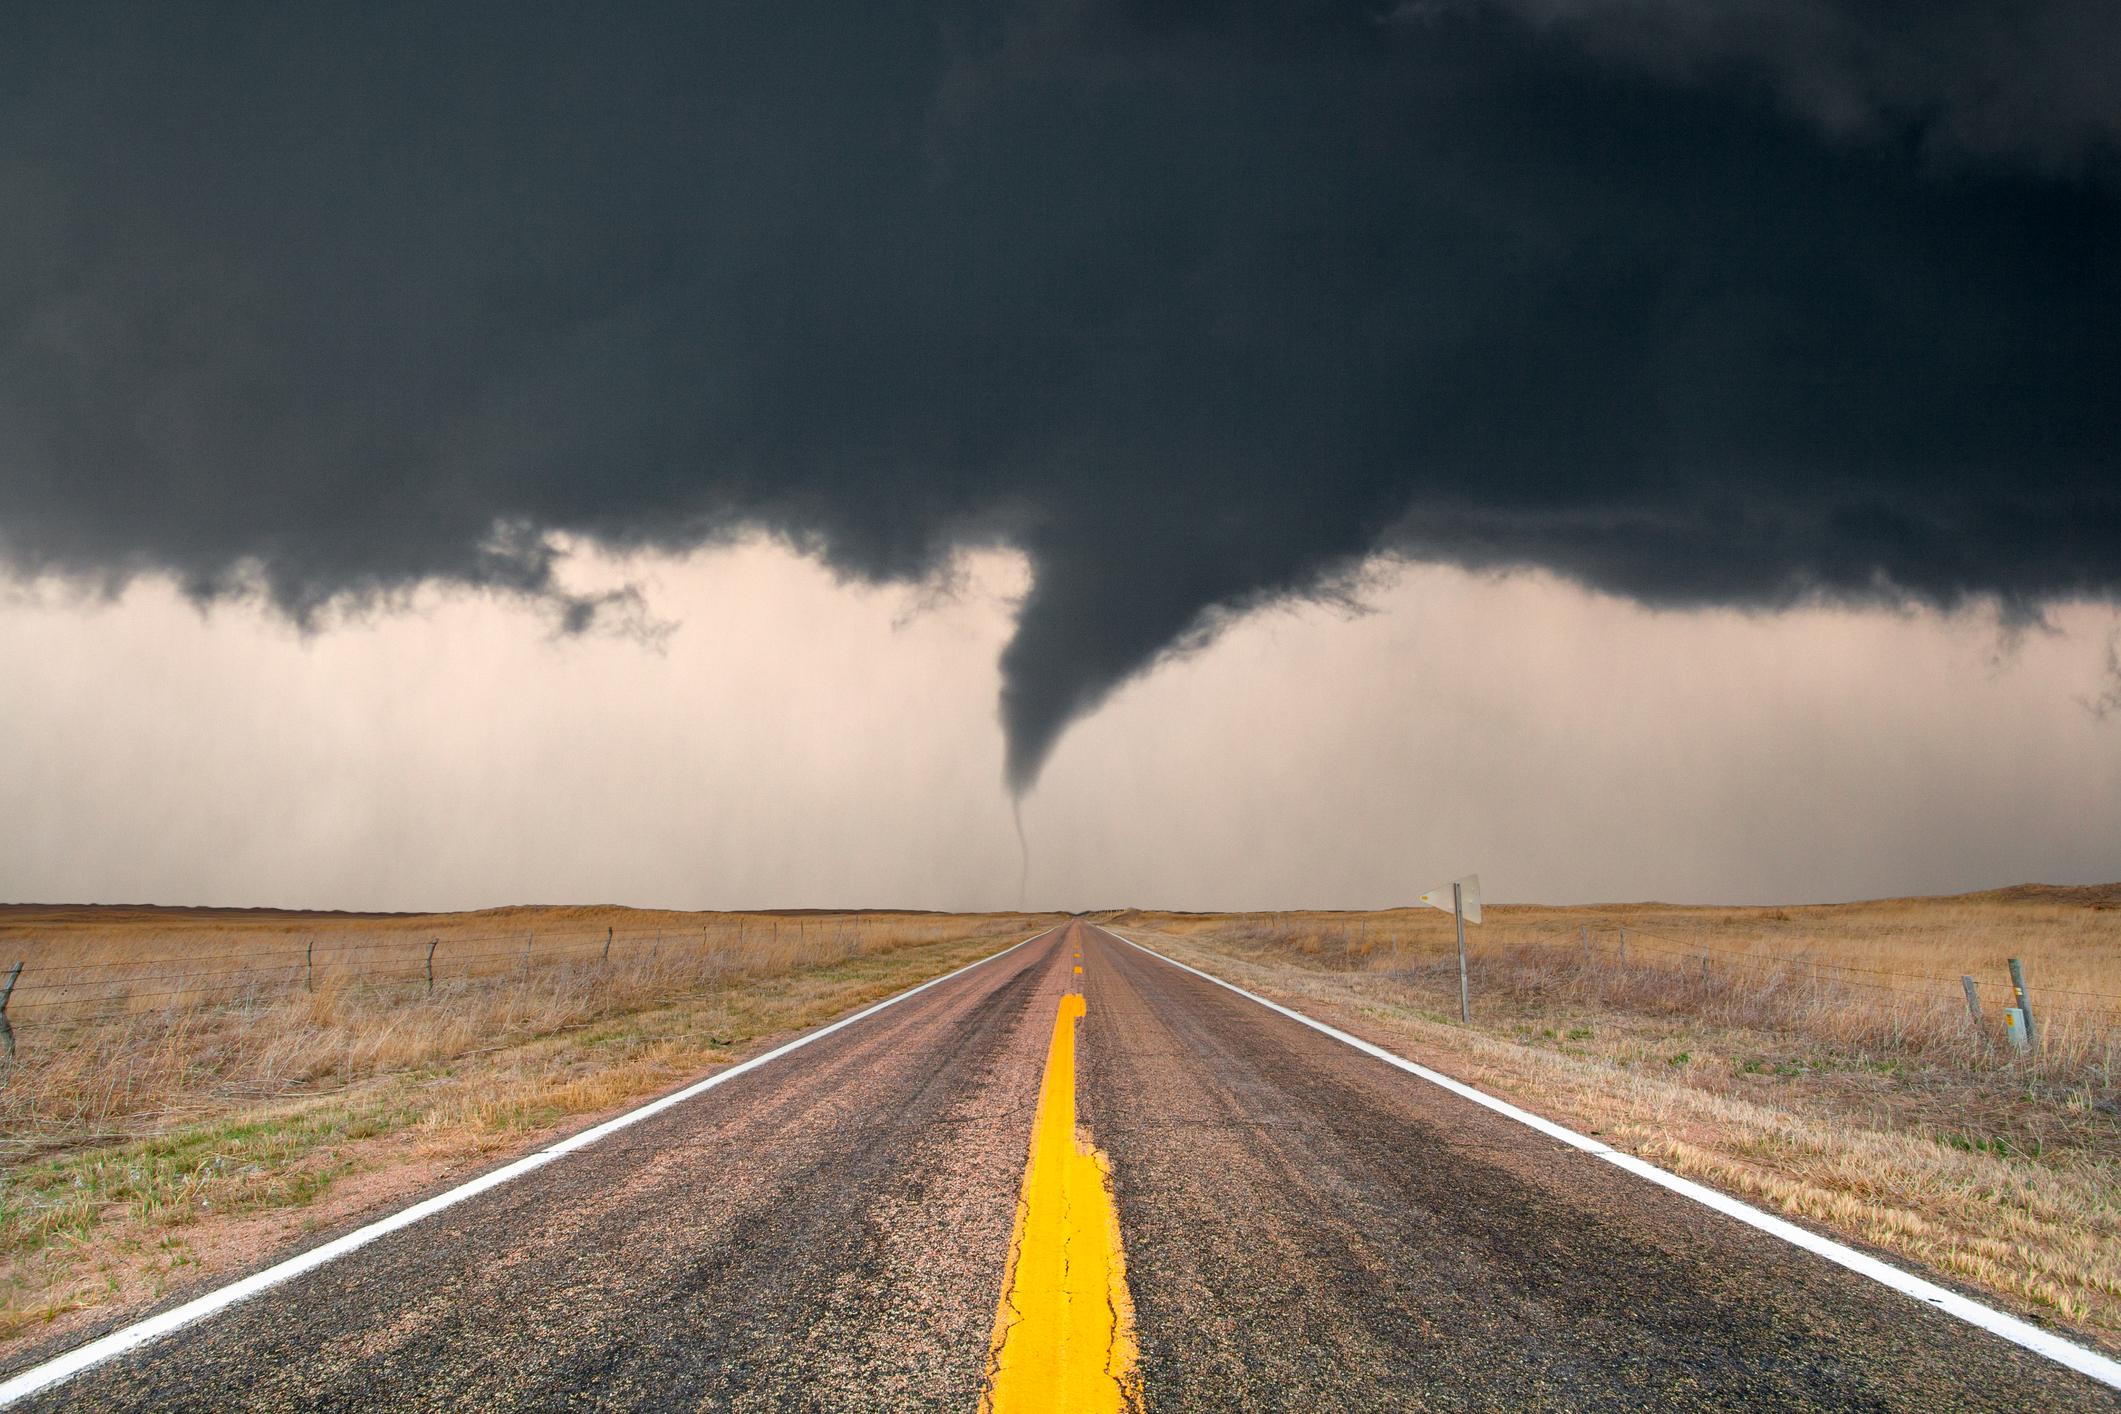 Driver Safety Tips For Tornado Season